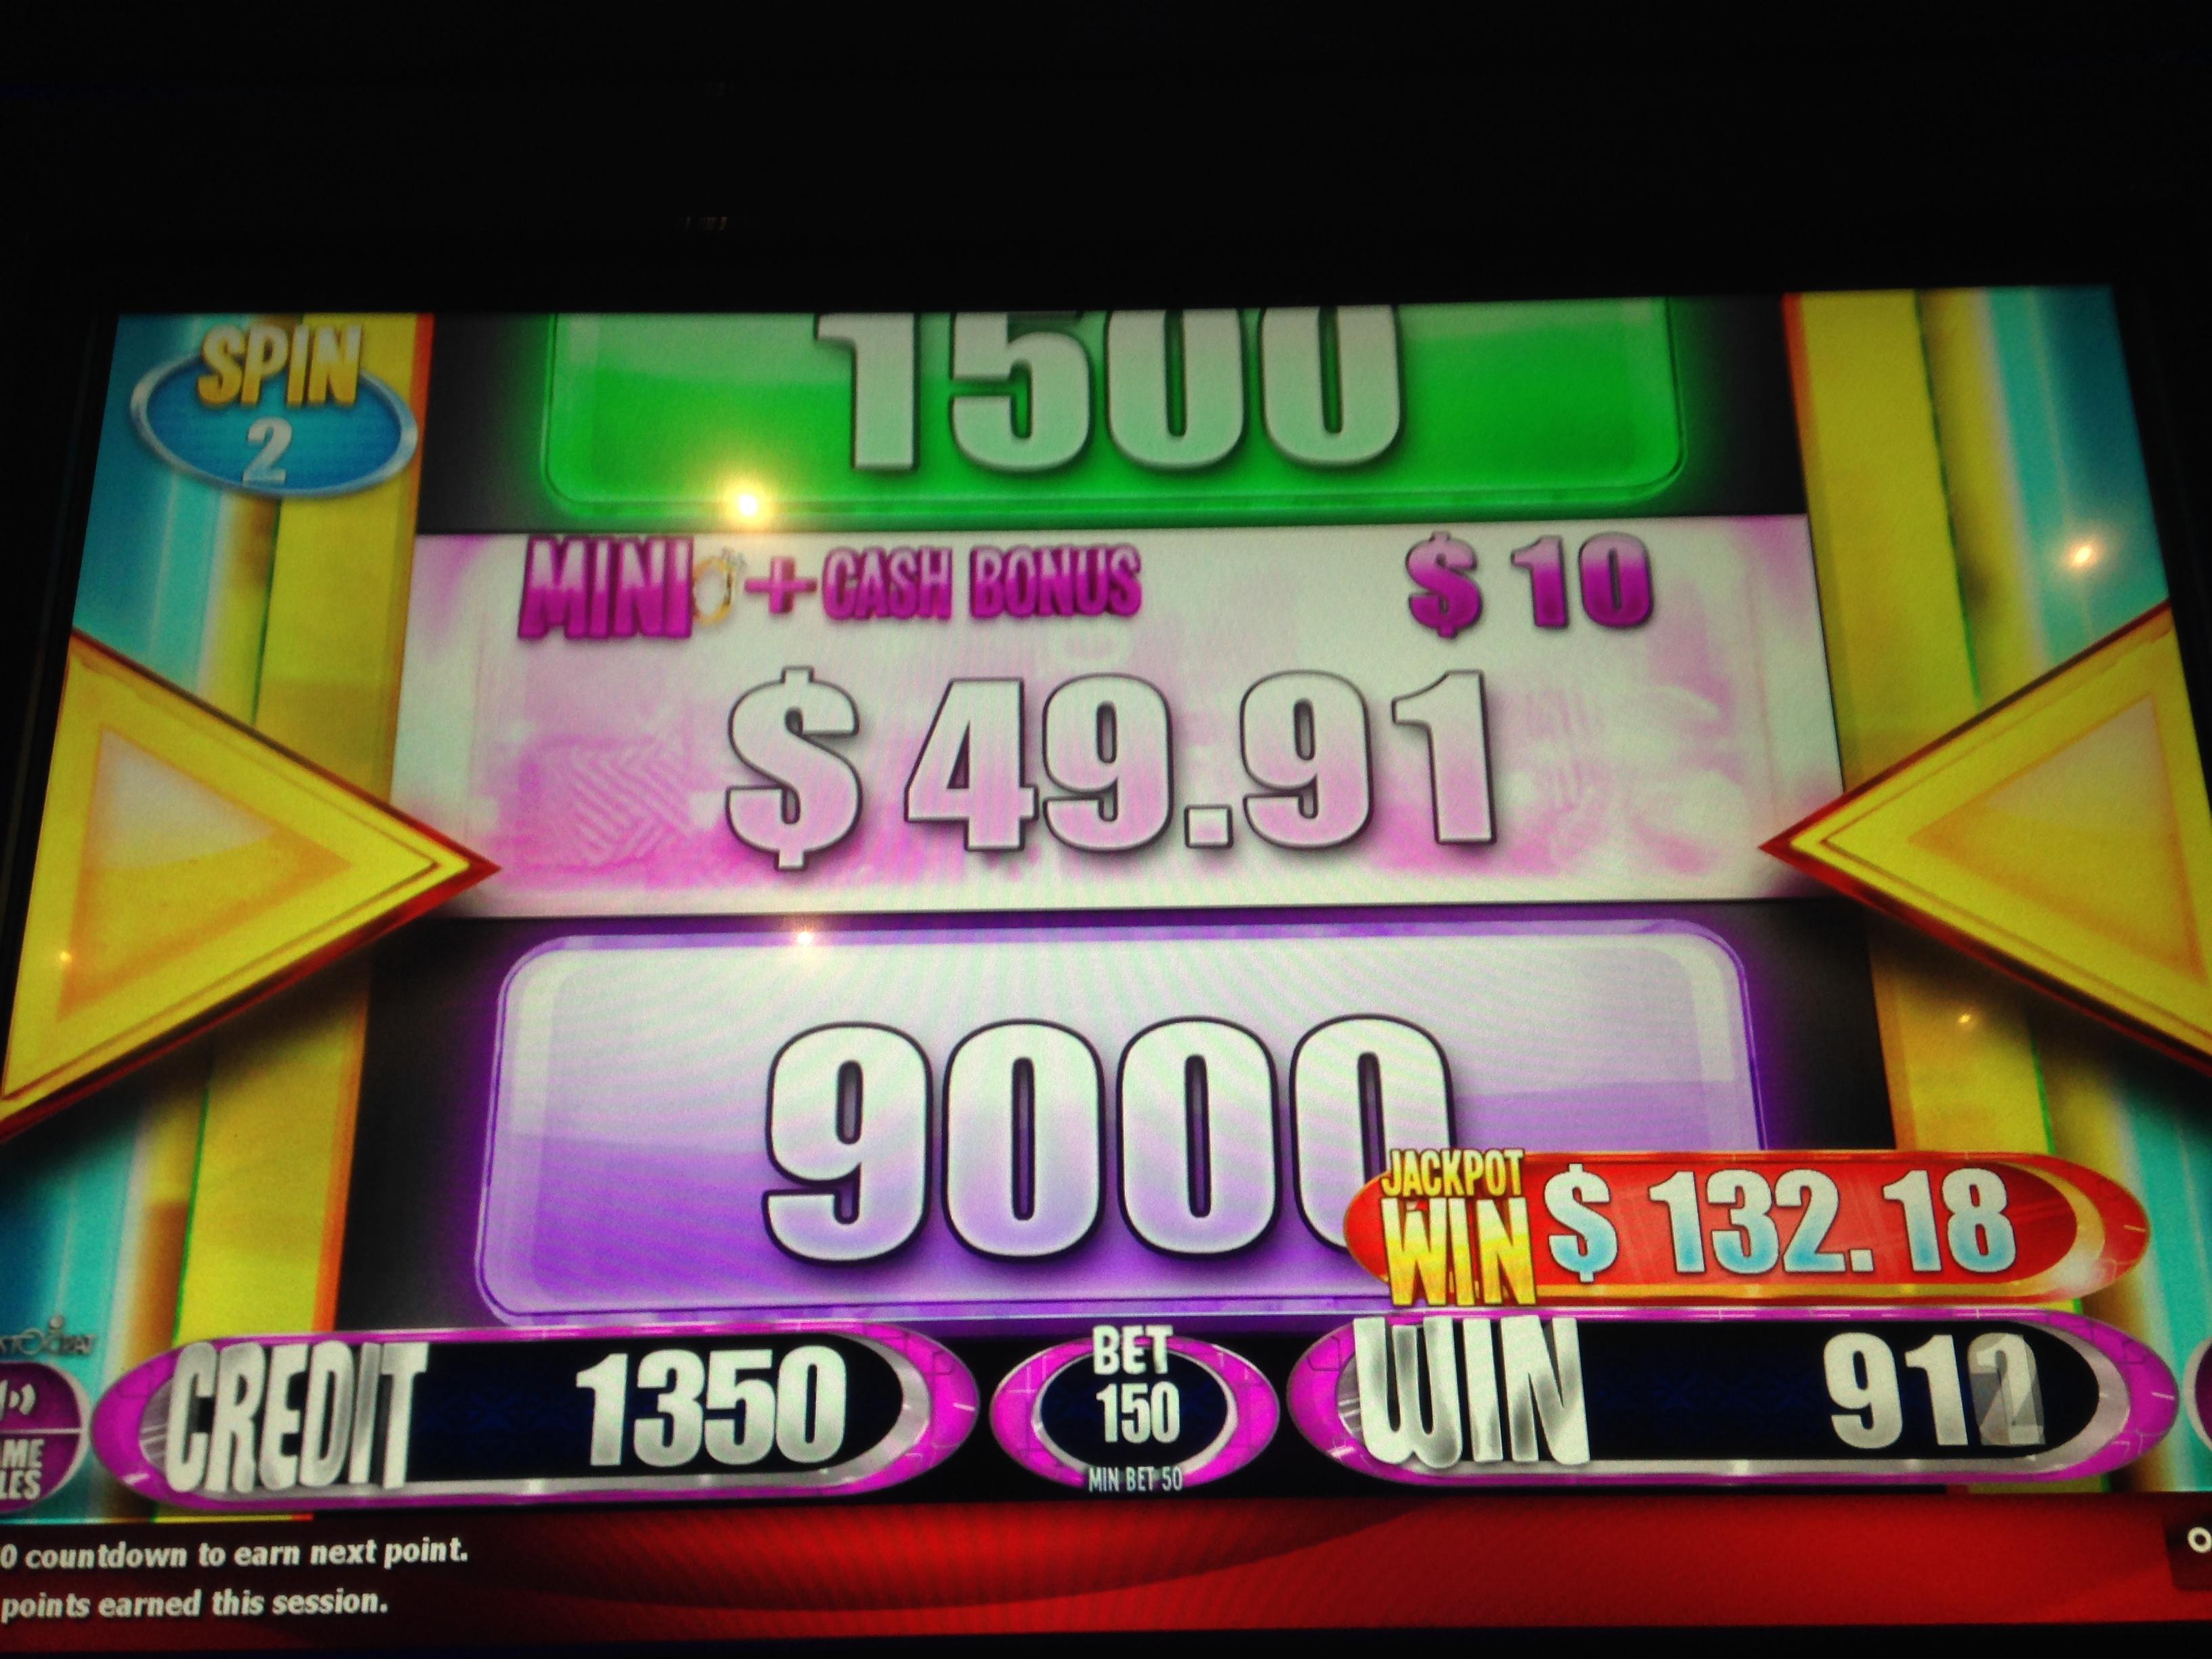 Second win